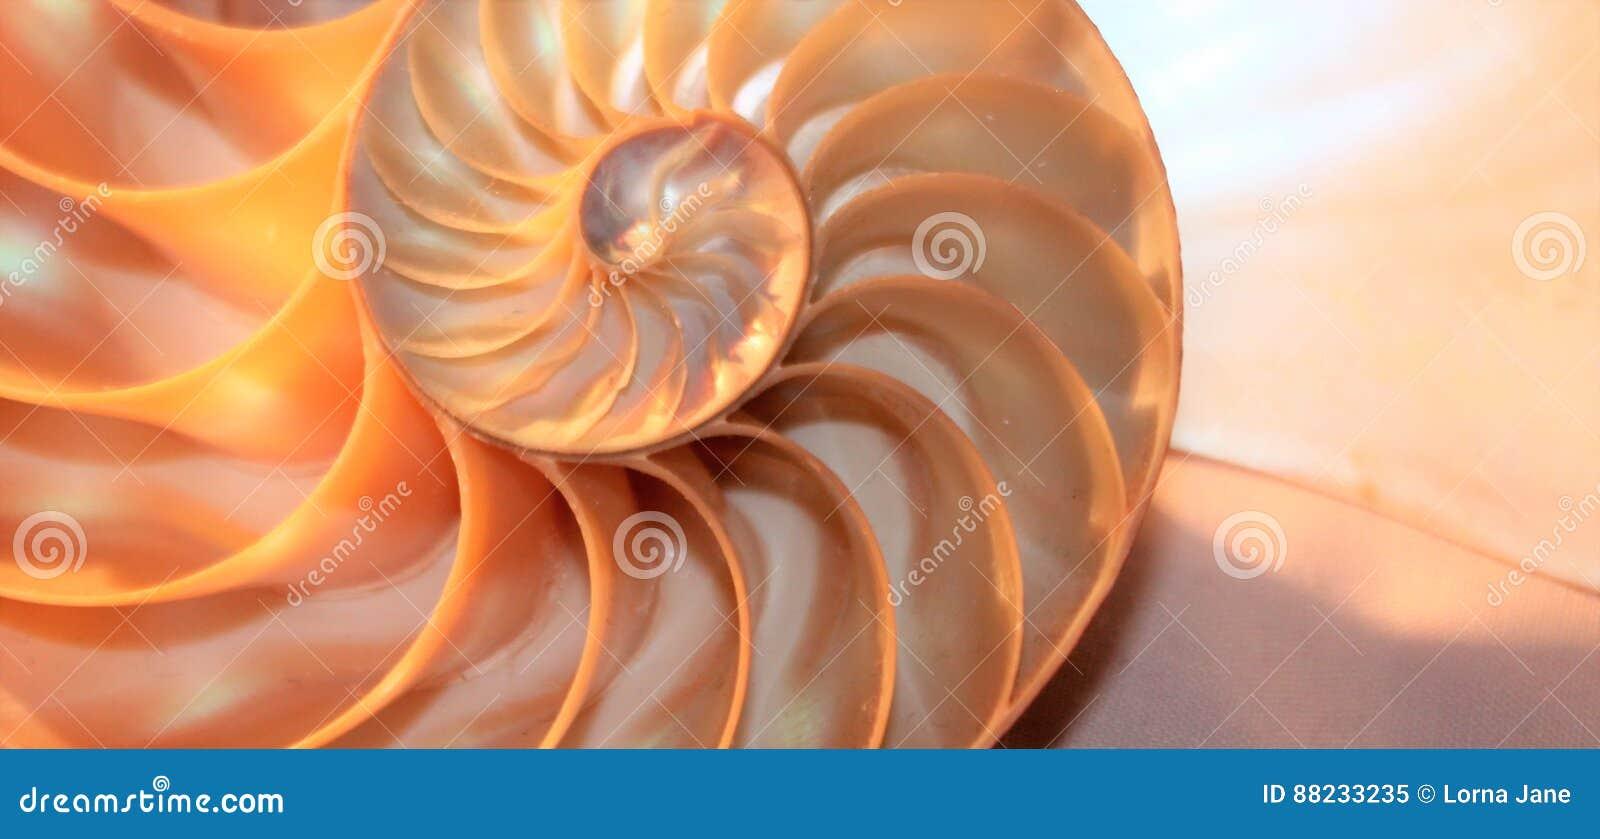 Nautilus κοχυλιών του Φιμπονάτσι συμμετρίας χρυσή αναλογία αύξησης δομών διατομής σπειροειδής